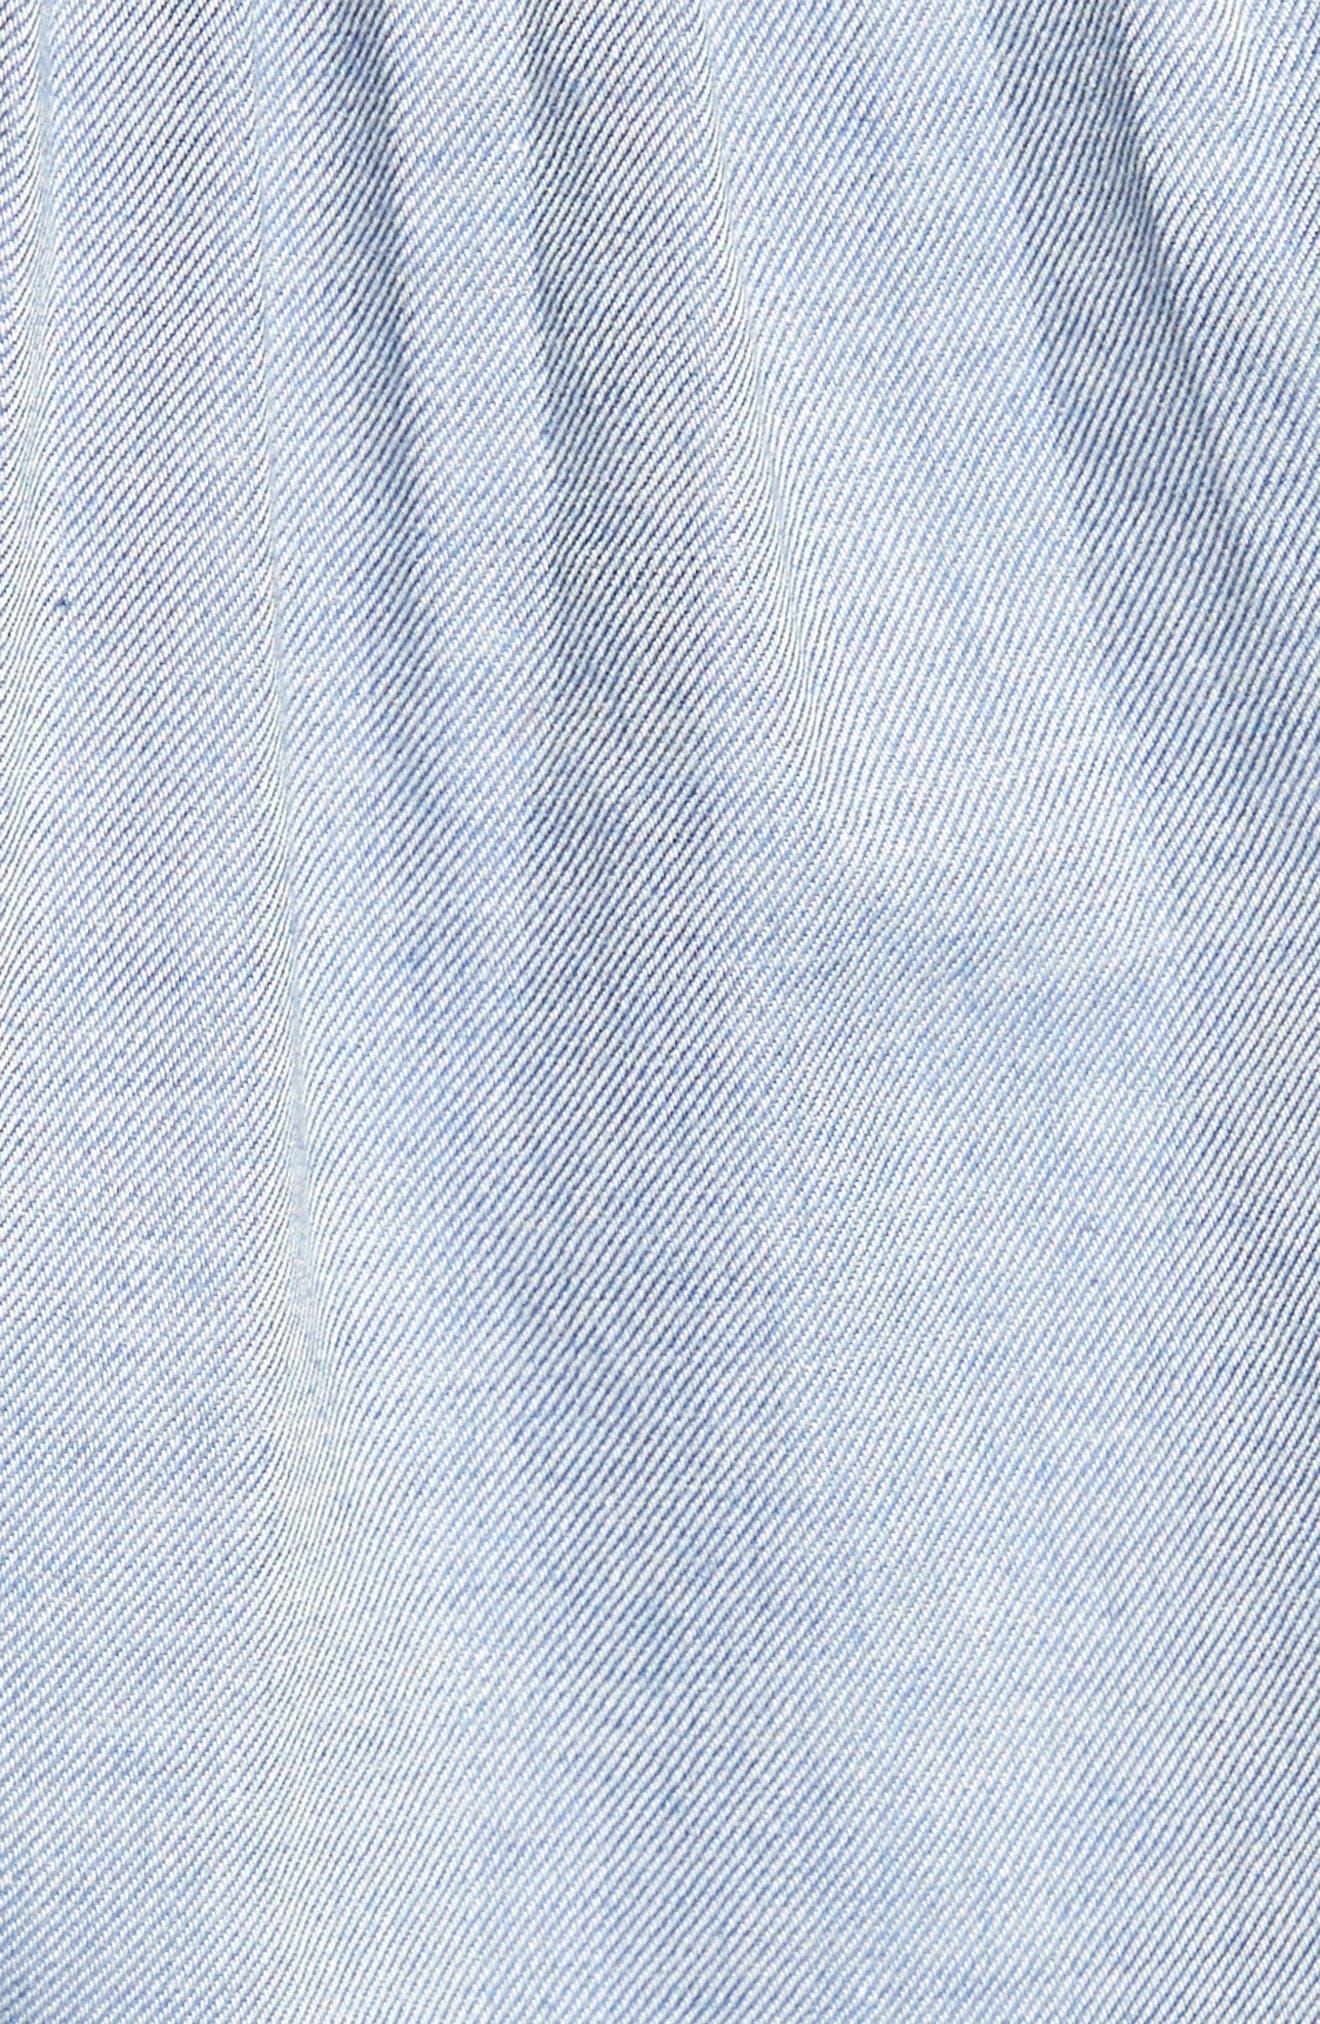 Edwardian Chambray Top,                             Alternate thumbnail 5, color,                             400